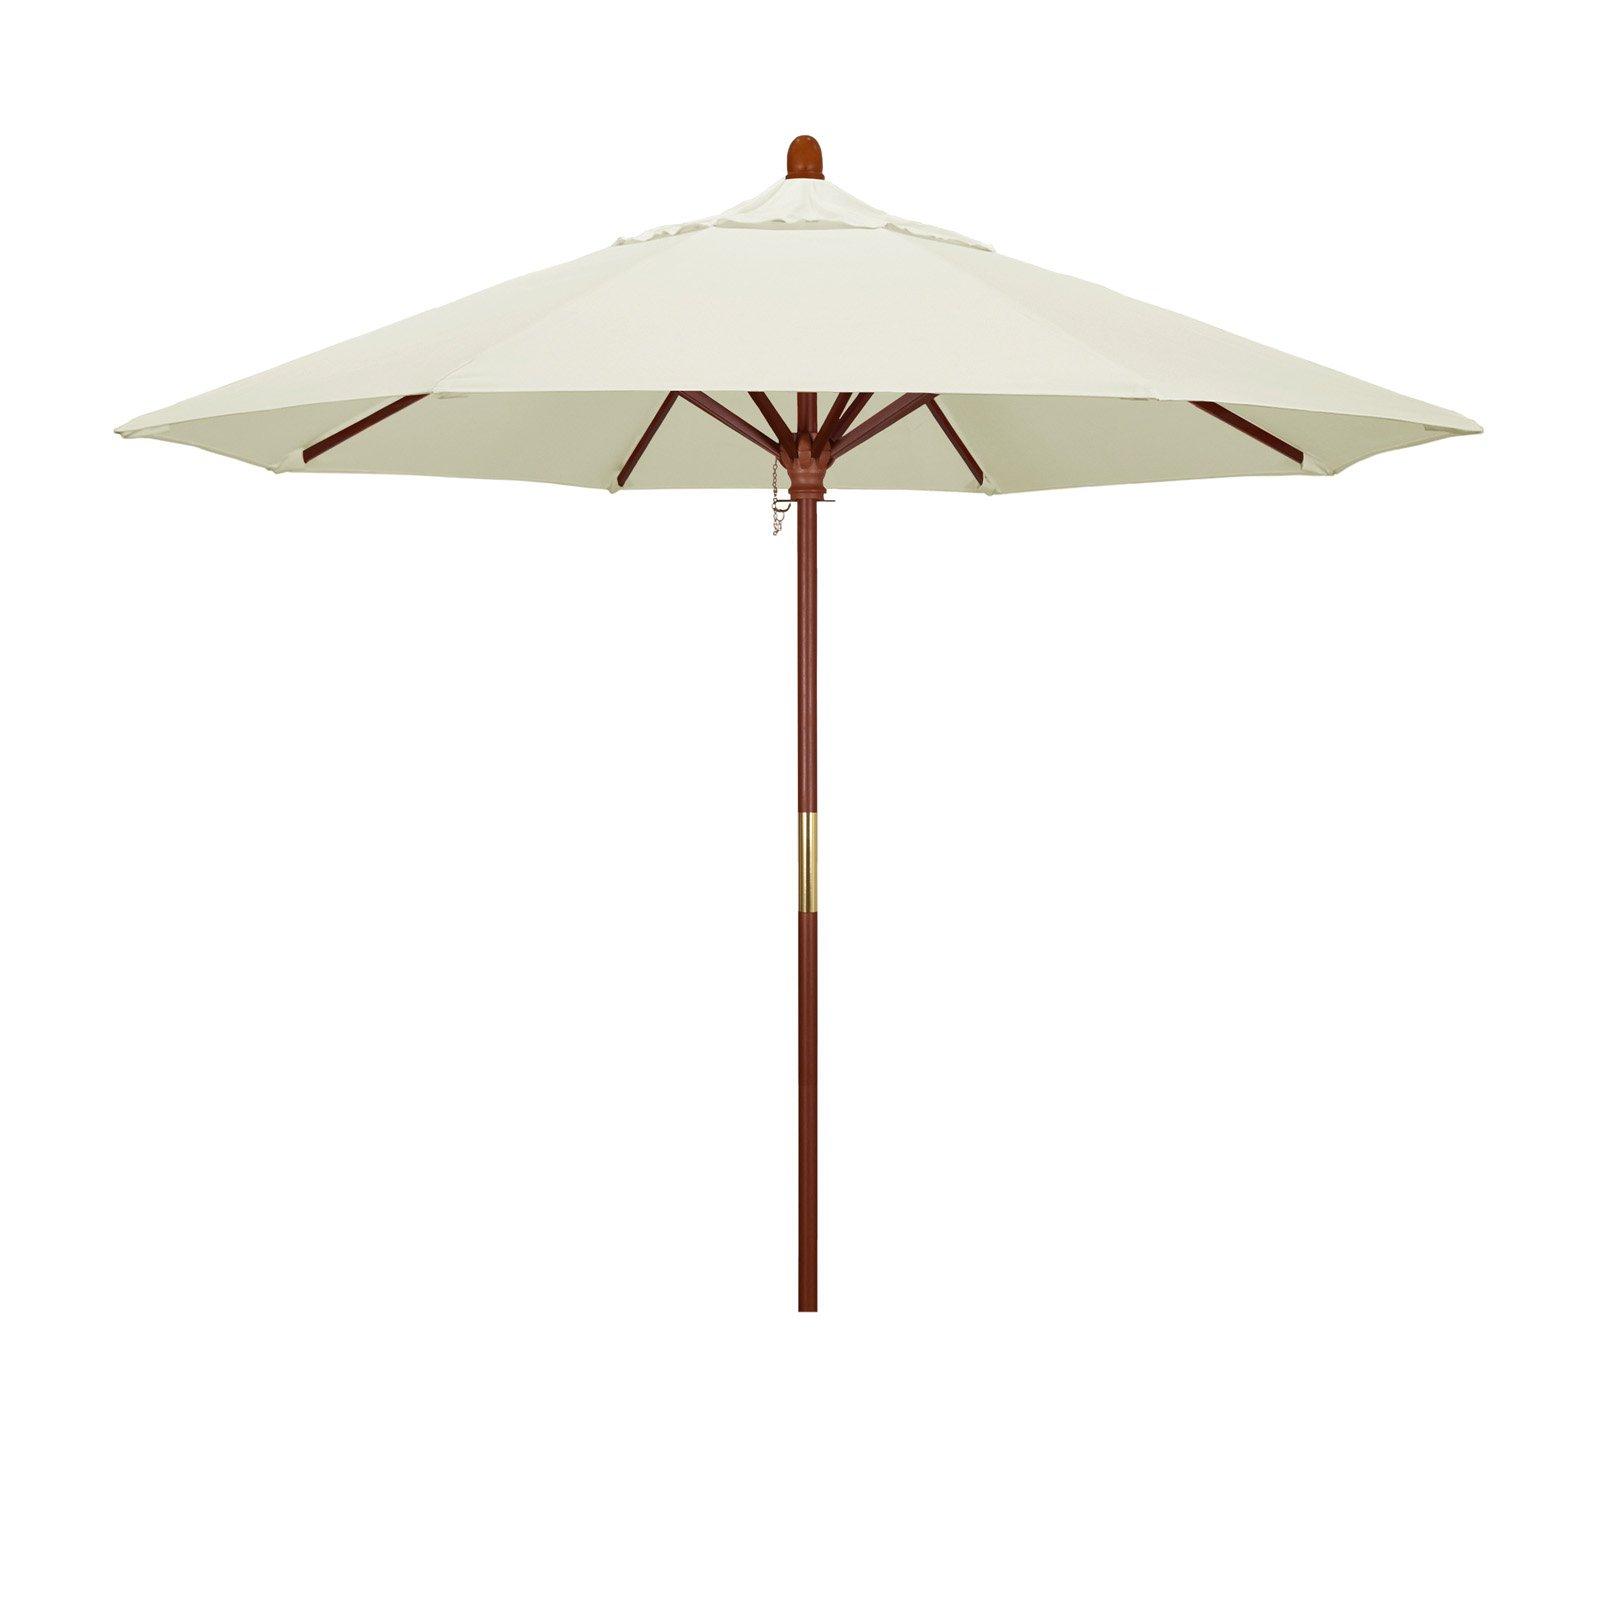 Crediton Market Umbrellas Intended For Latest California Umbrella 9 Ft (View 5 of 20)